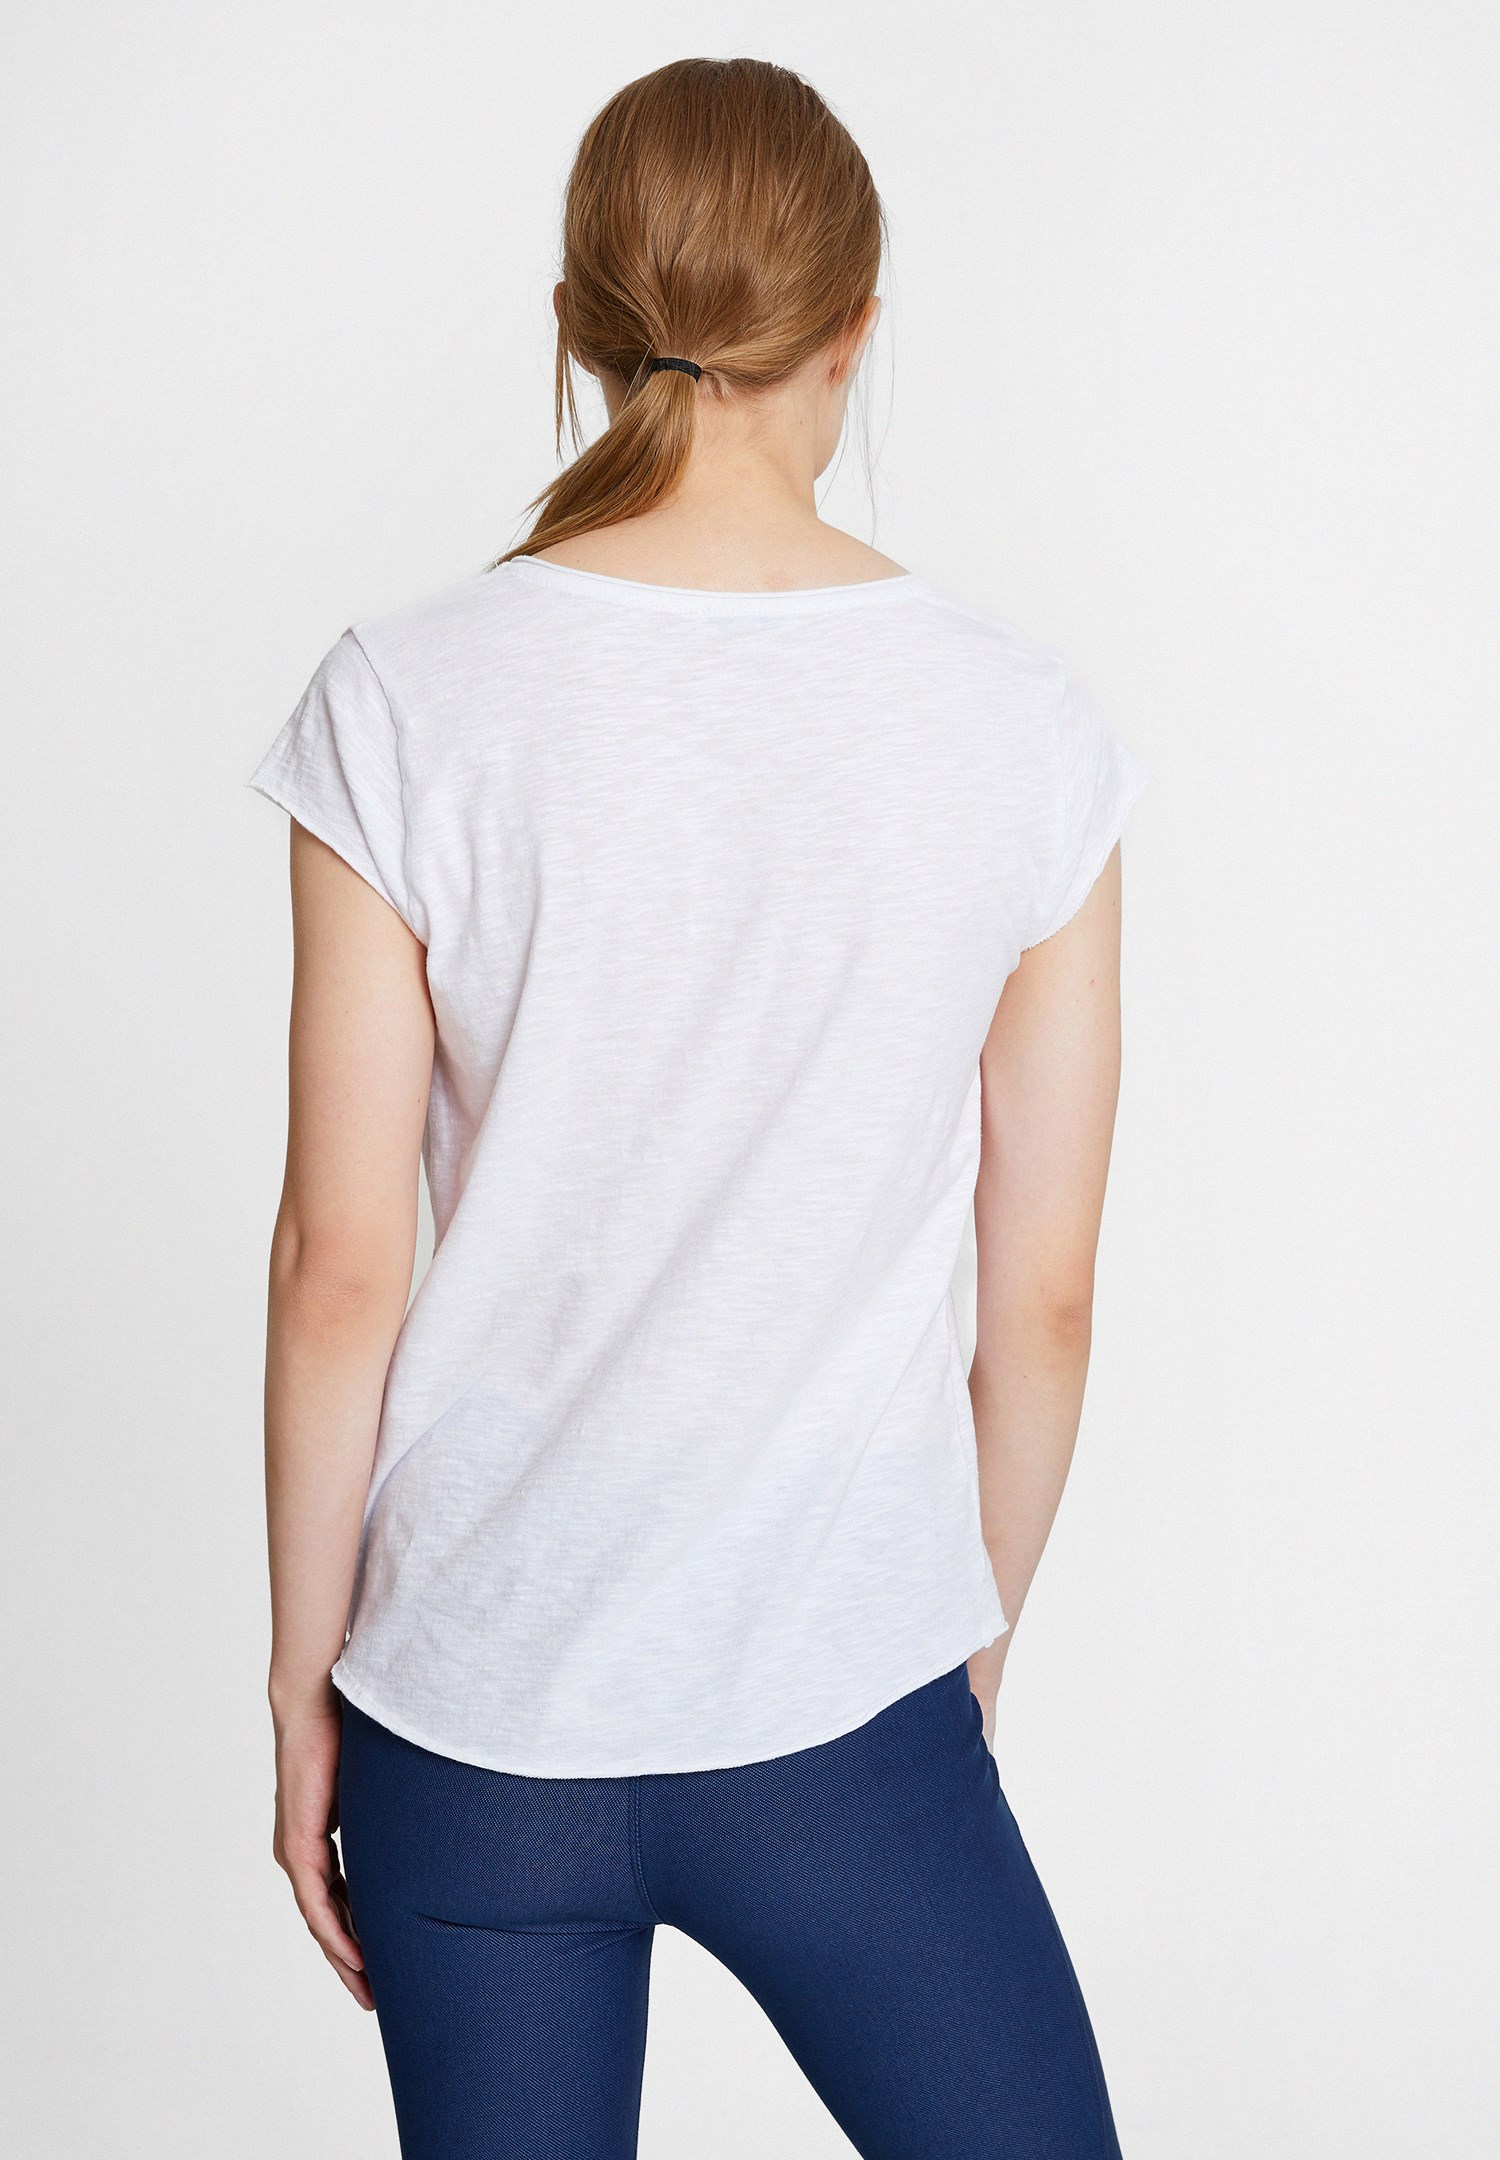 Bayan Beyaz Nakışlı V Yaka Pamuk Tişört